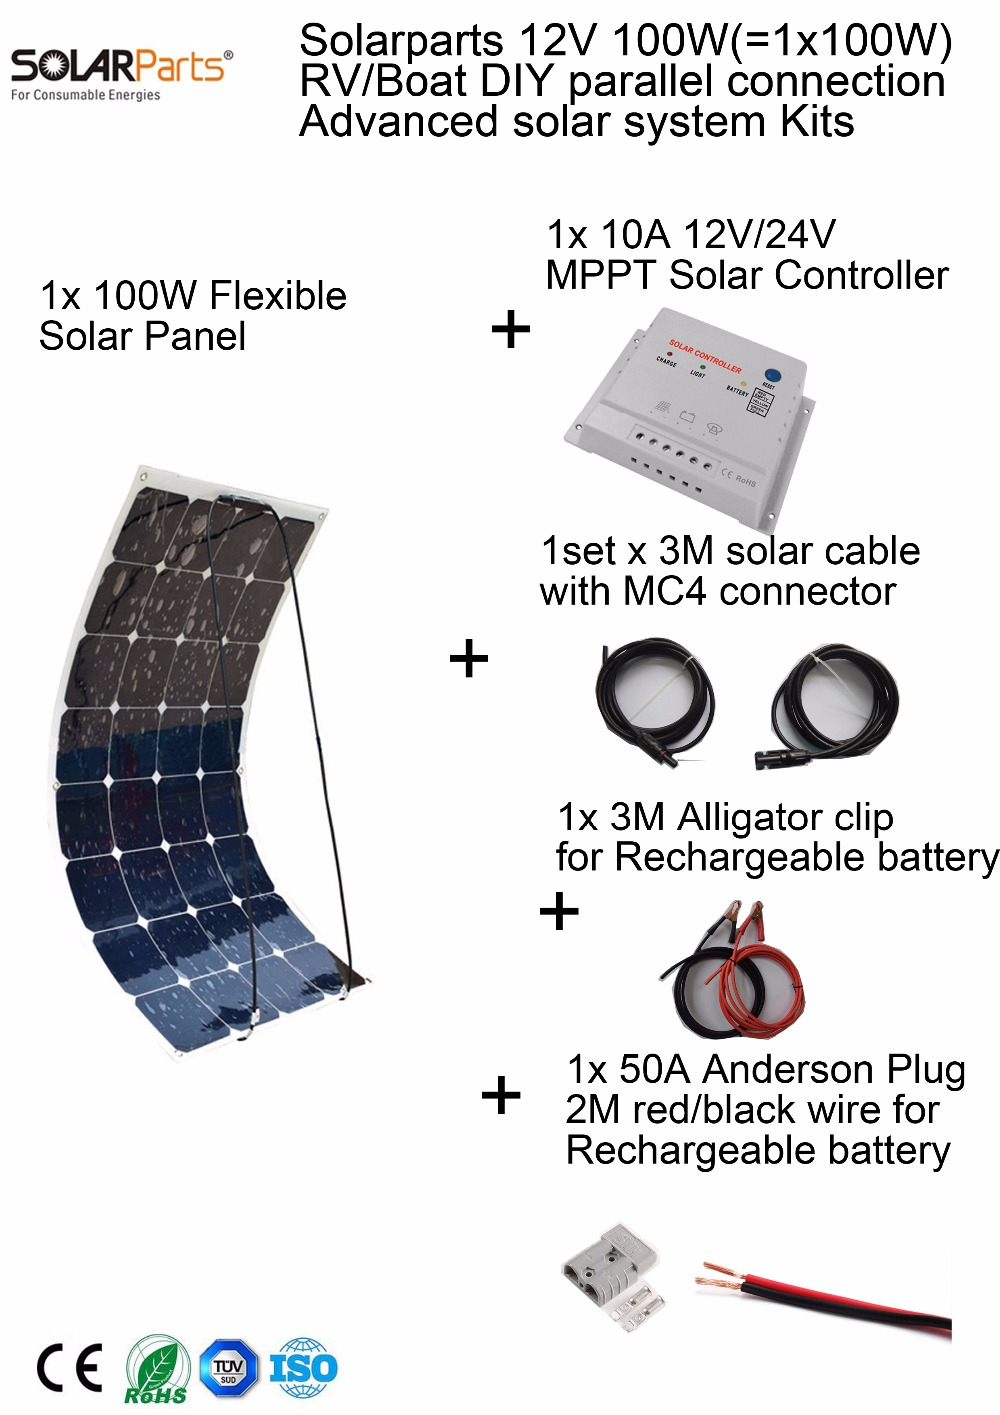 Solarparts 100W DIY RV/Marine Kits Solar System 1x100W flexible solar panel 12V, 1 x 10A MPPT solar controller set cables cheap(China (Mainland))